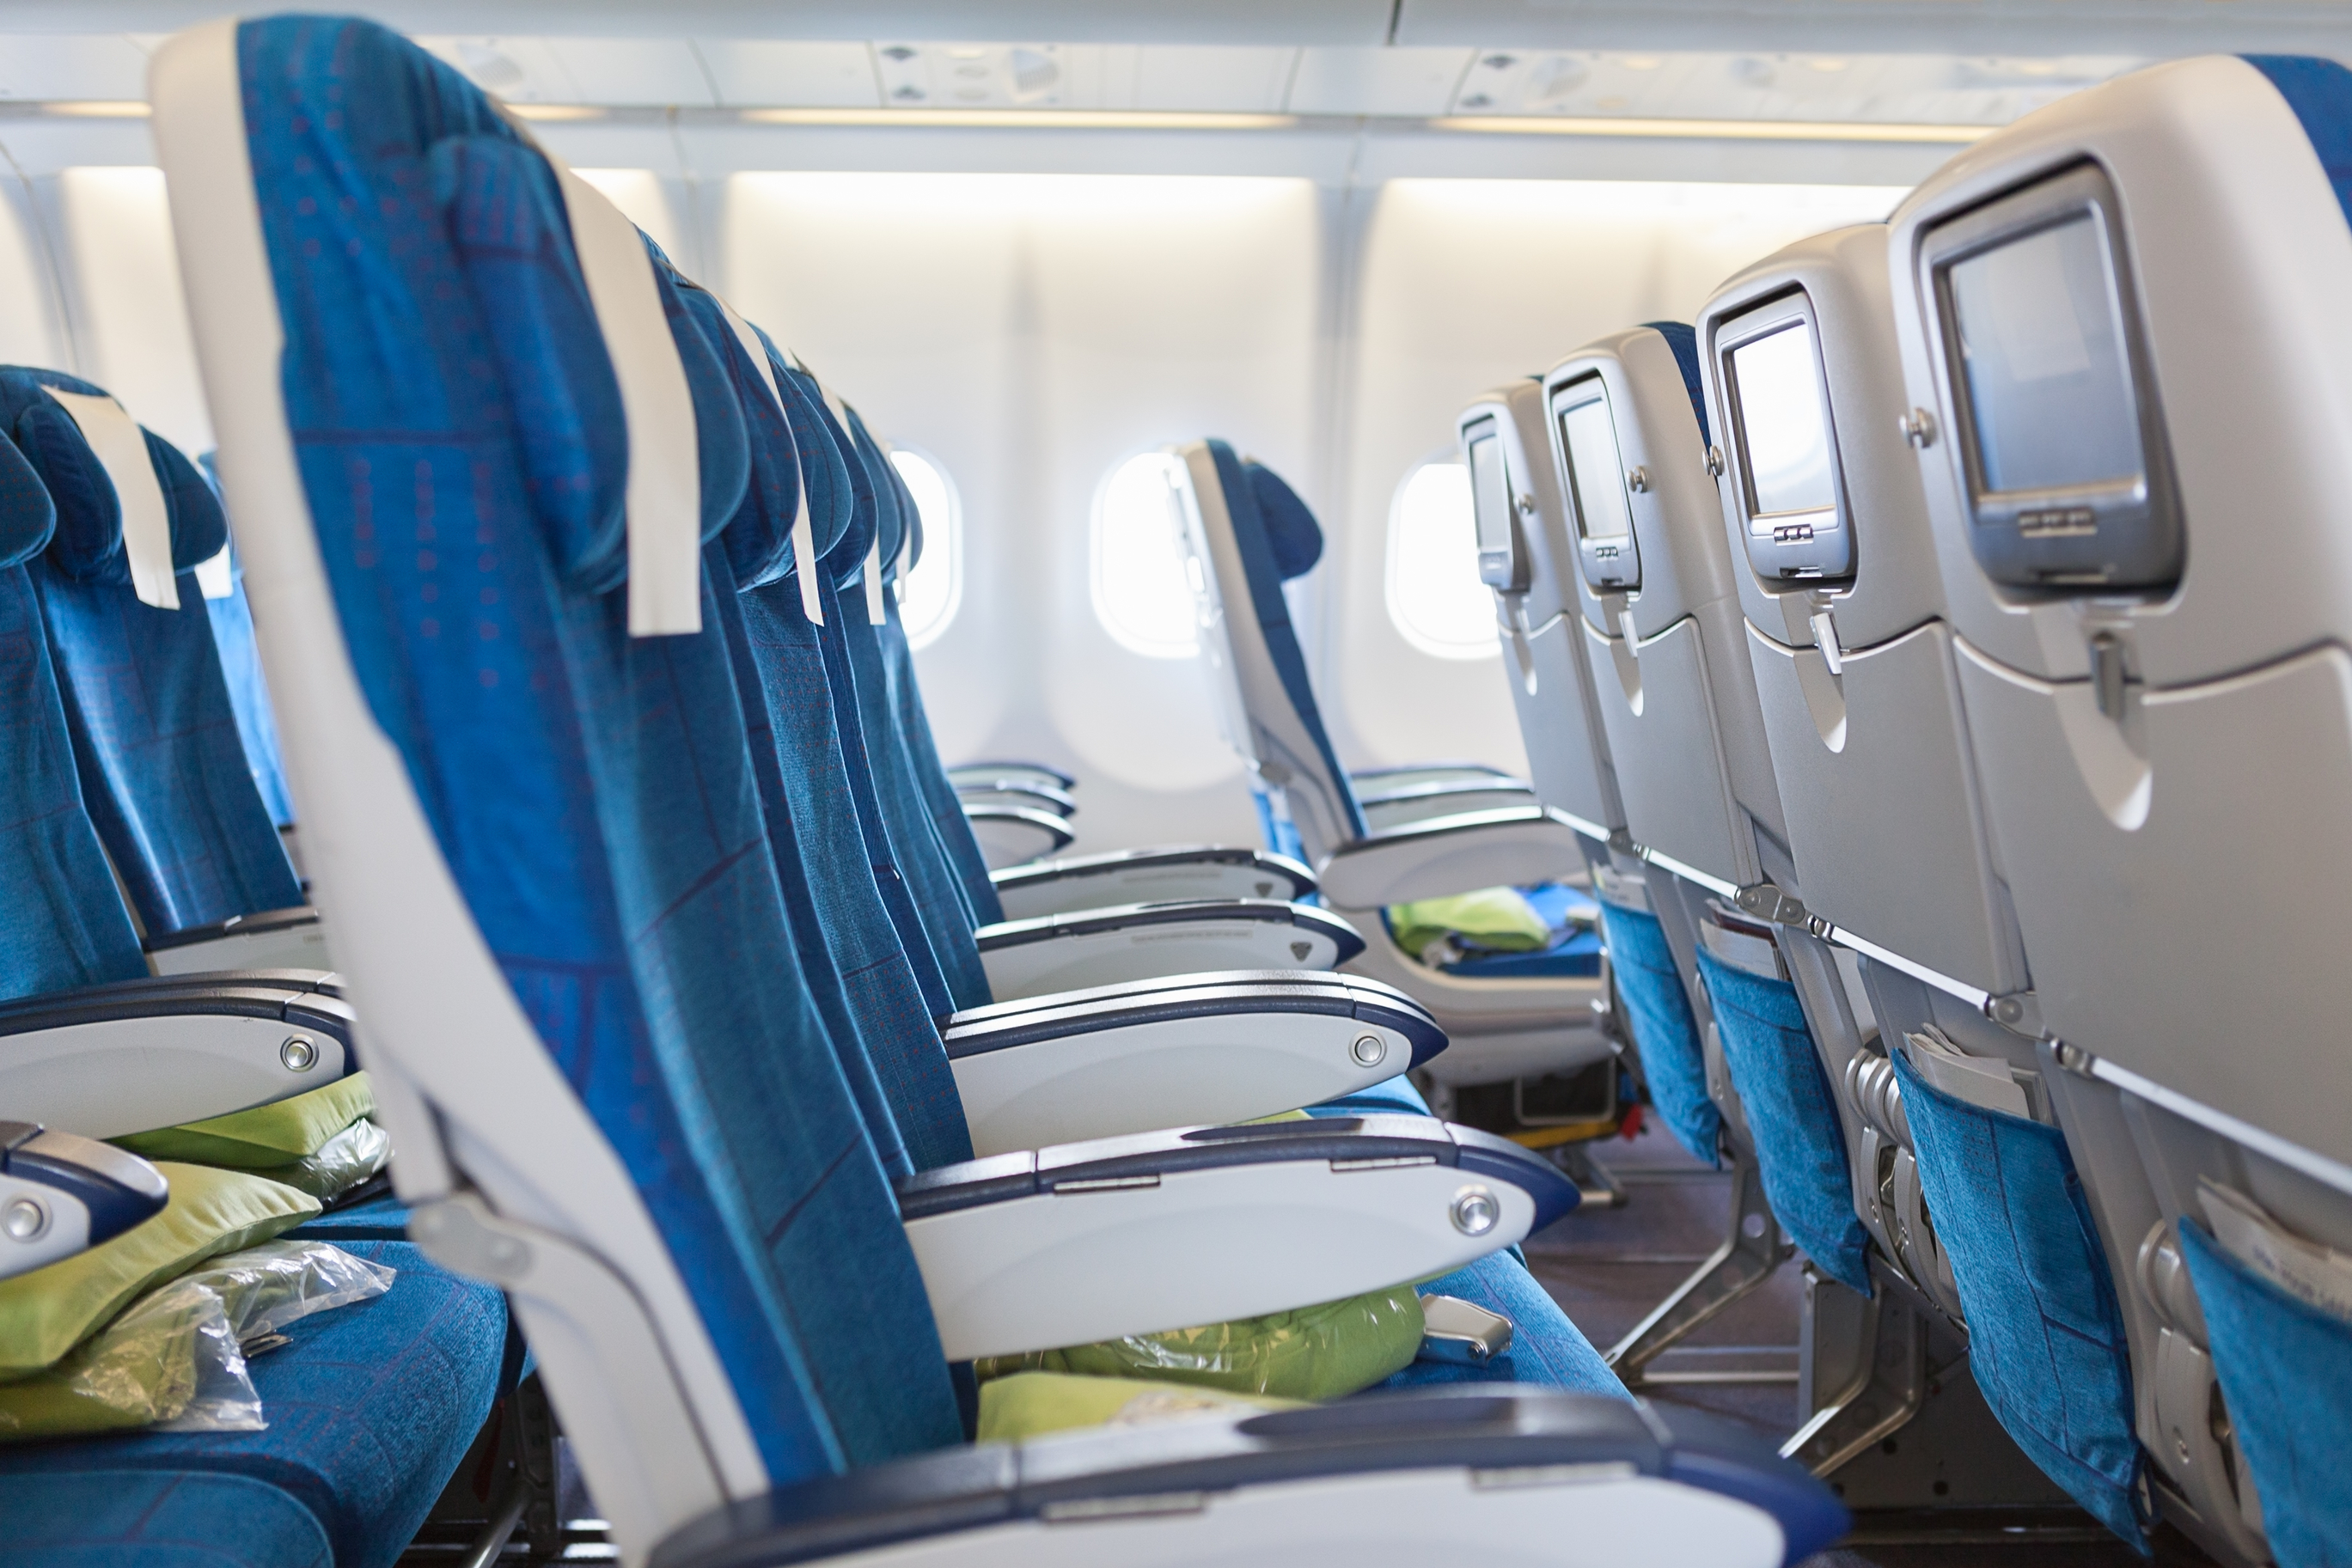 row-seats-plane.jpg?mtime=20180710131027#asset:102450